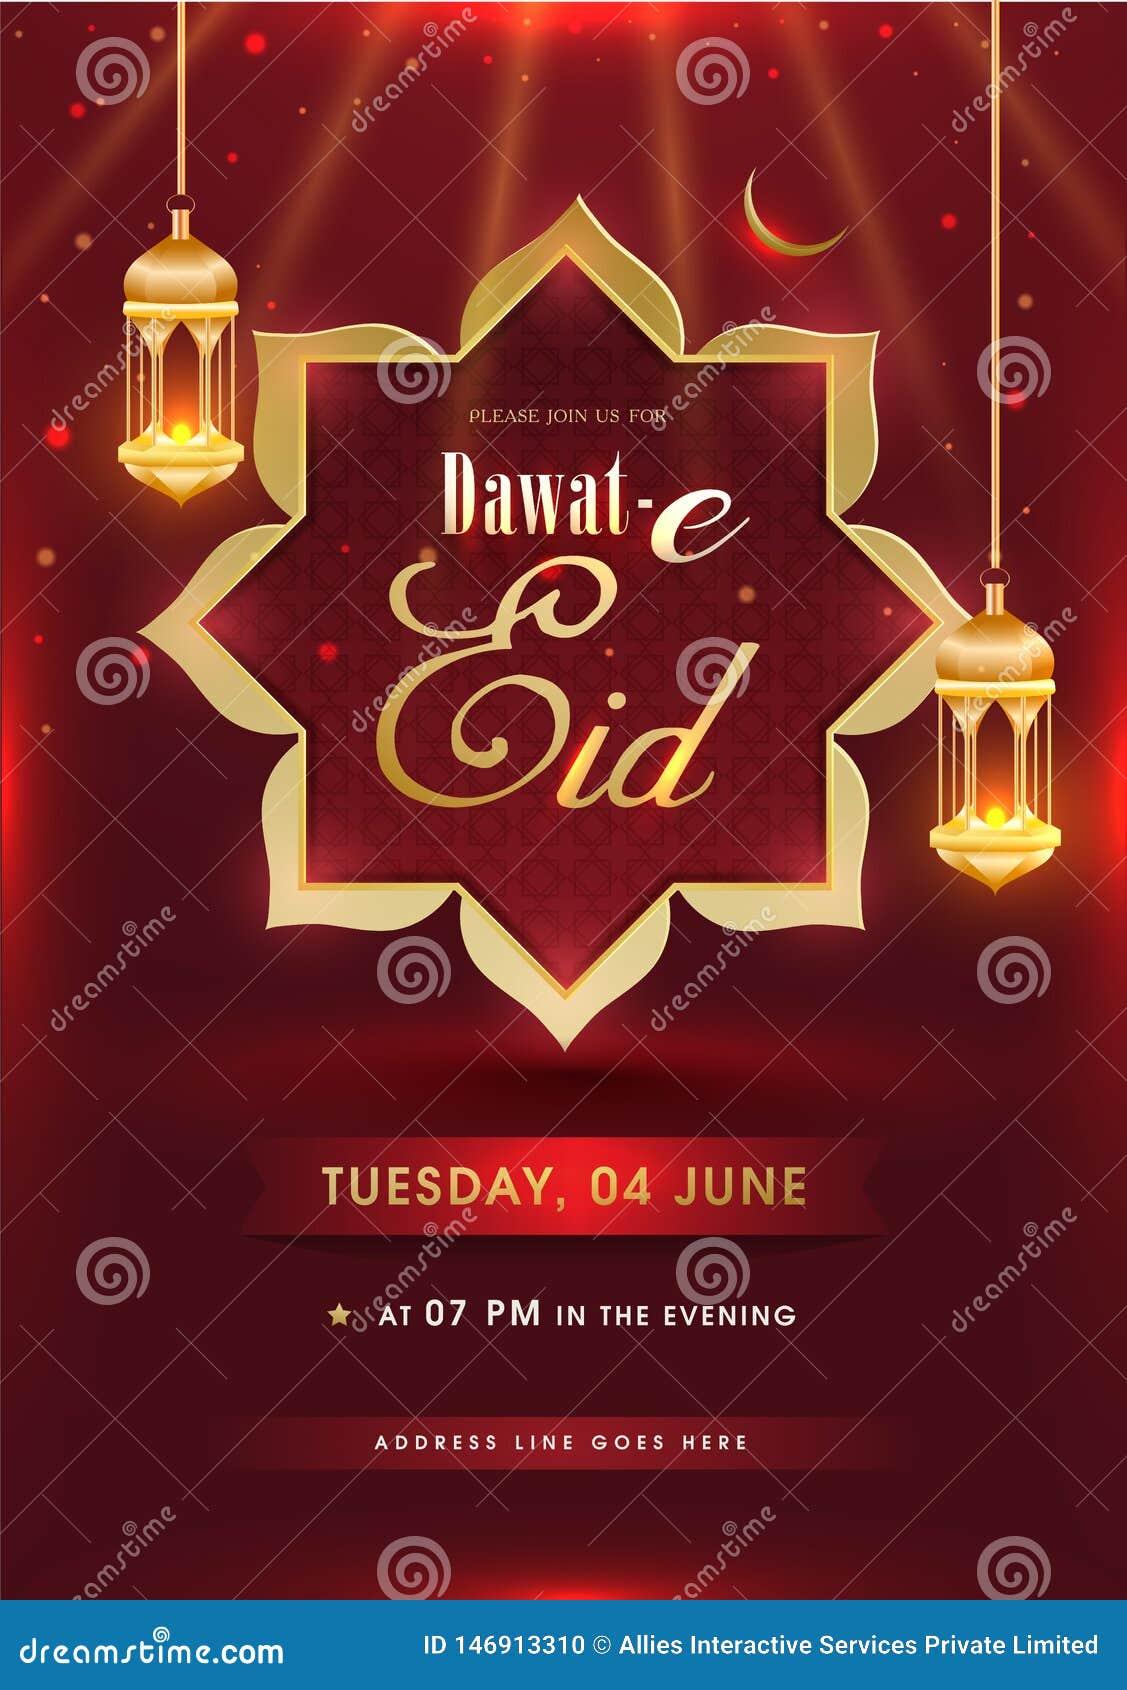 Dawat E Eid Invitation Card Design With Hanging Illuminated